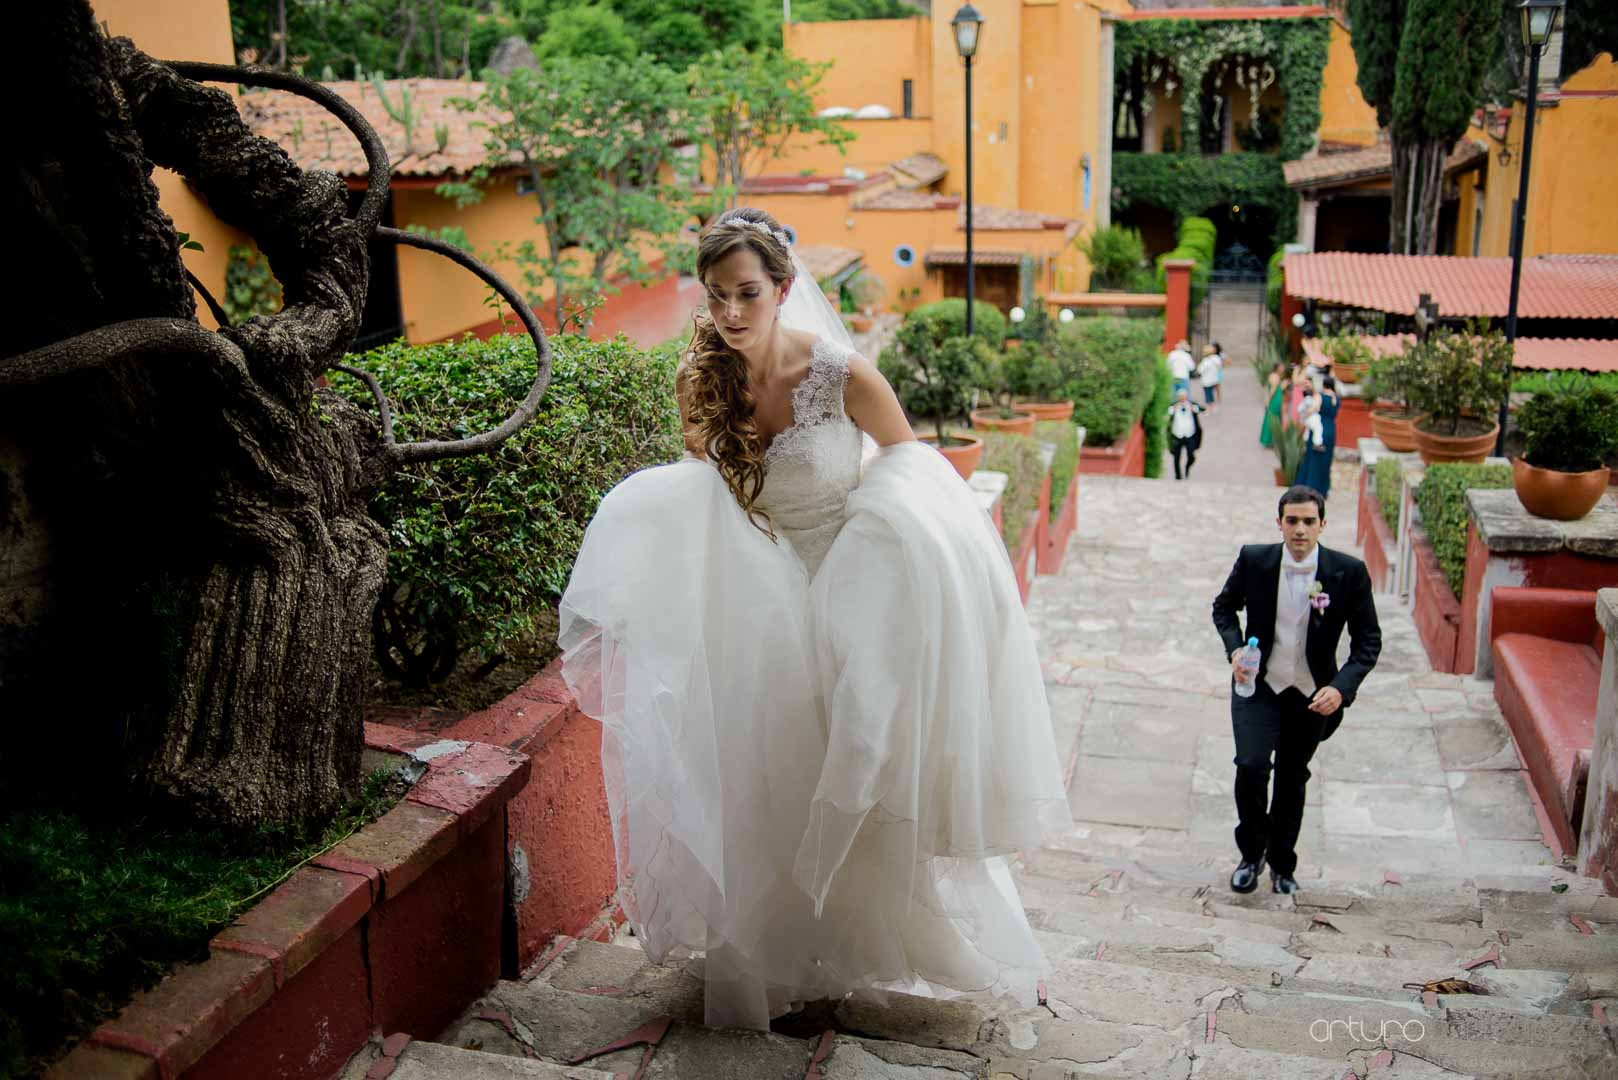 fotografo-de-bodas-en-guanajuato-43